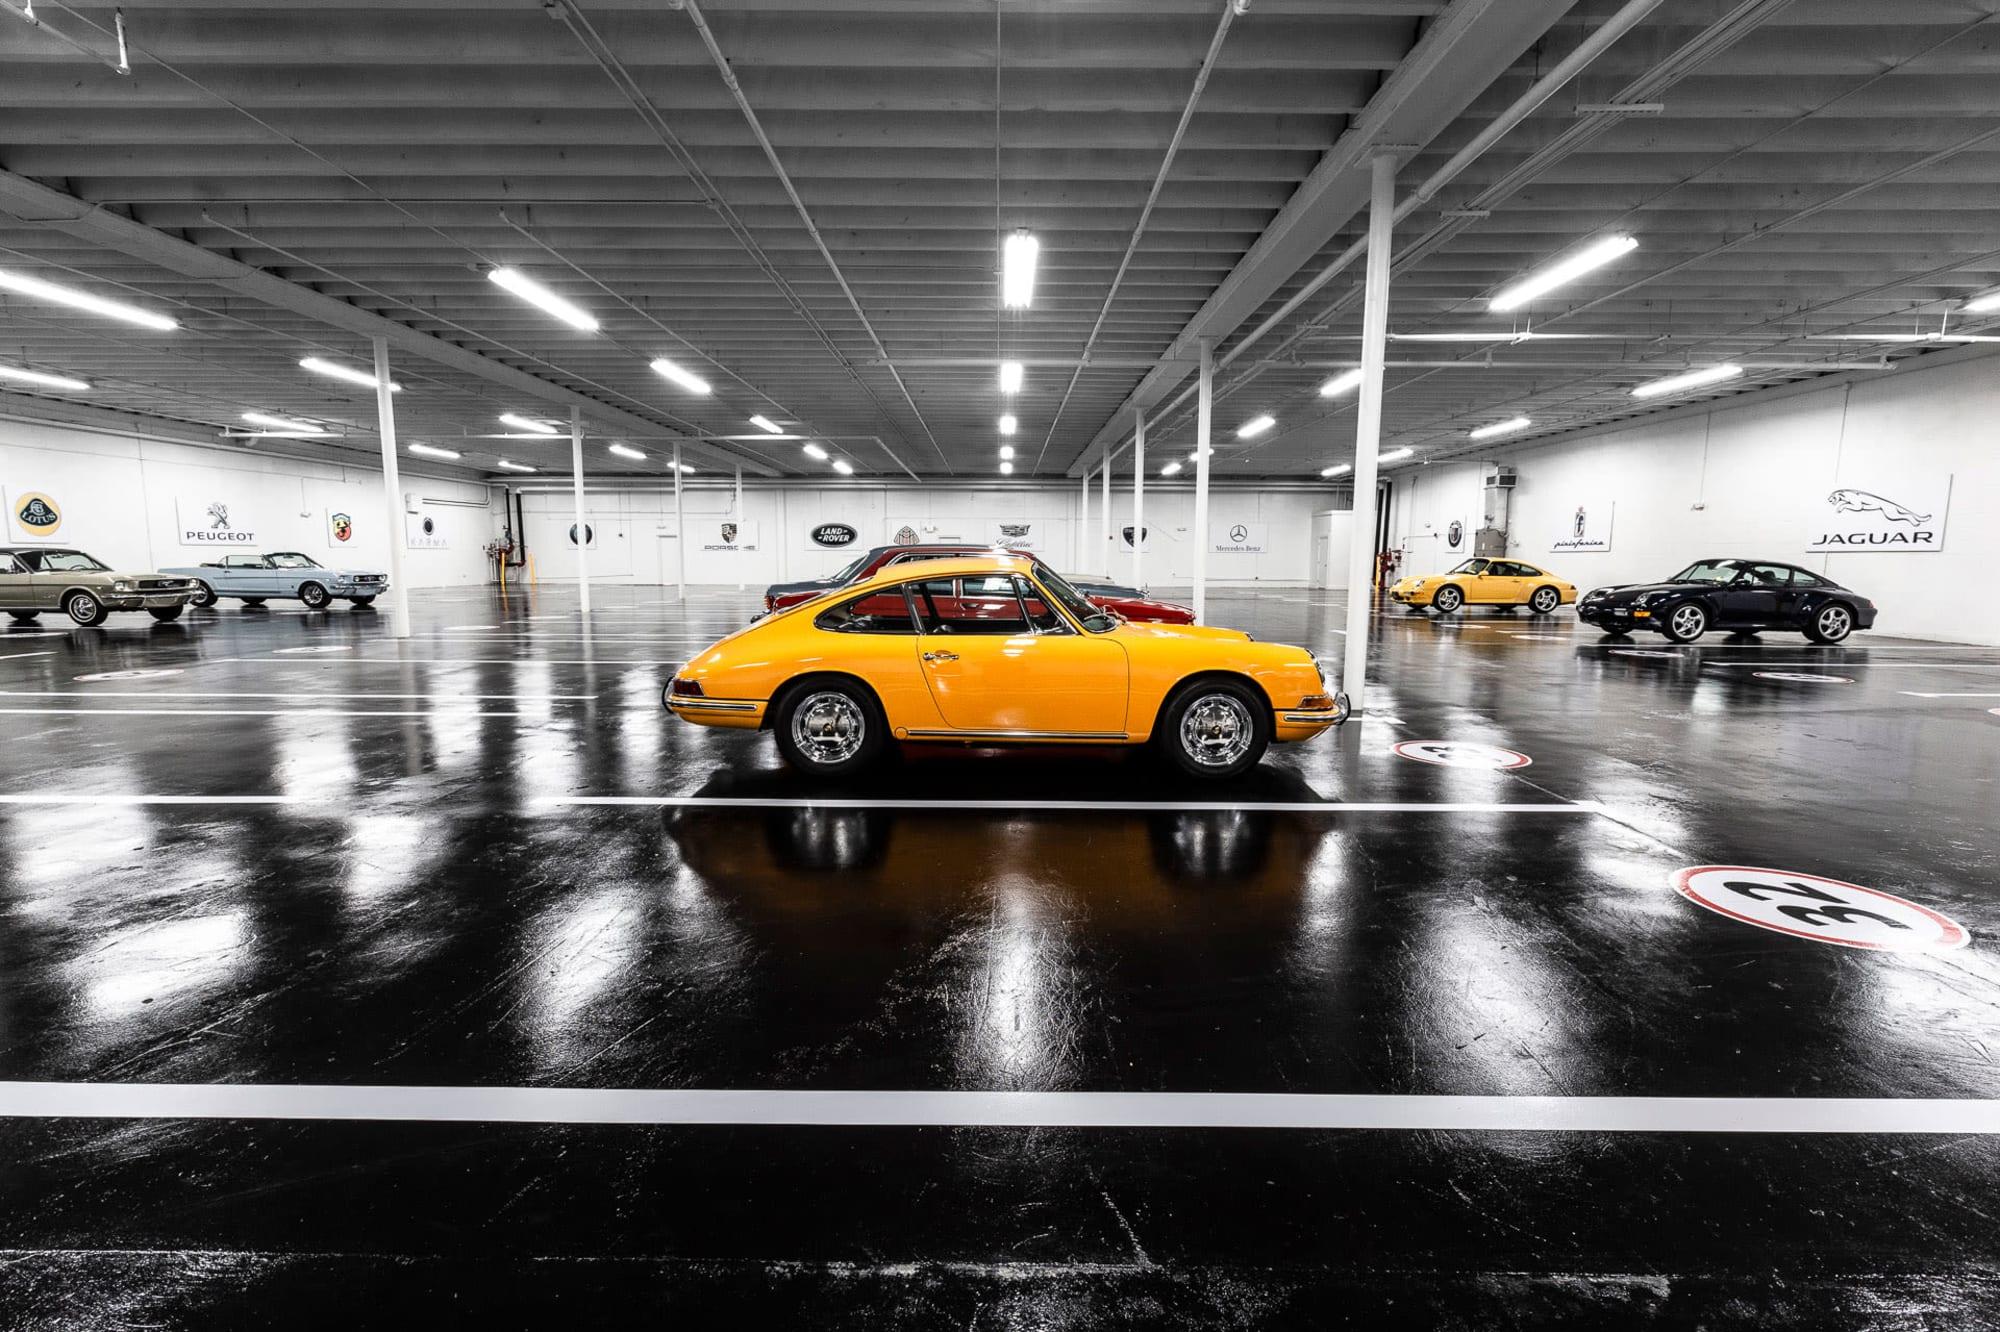 The profile of a yellow Porsche sports car, stored at Premier Car Storage in Miami, Florida/